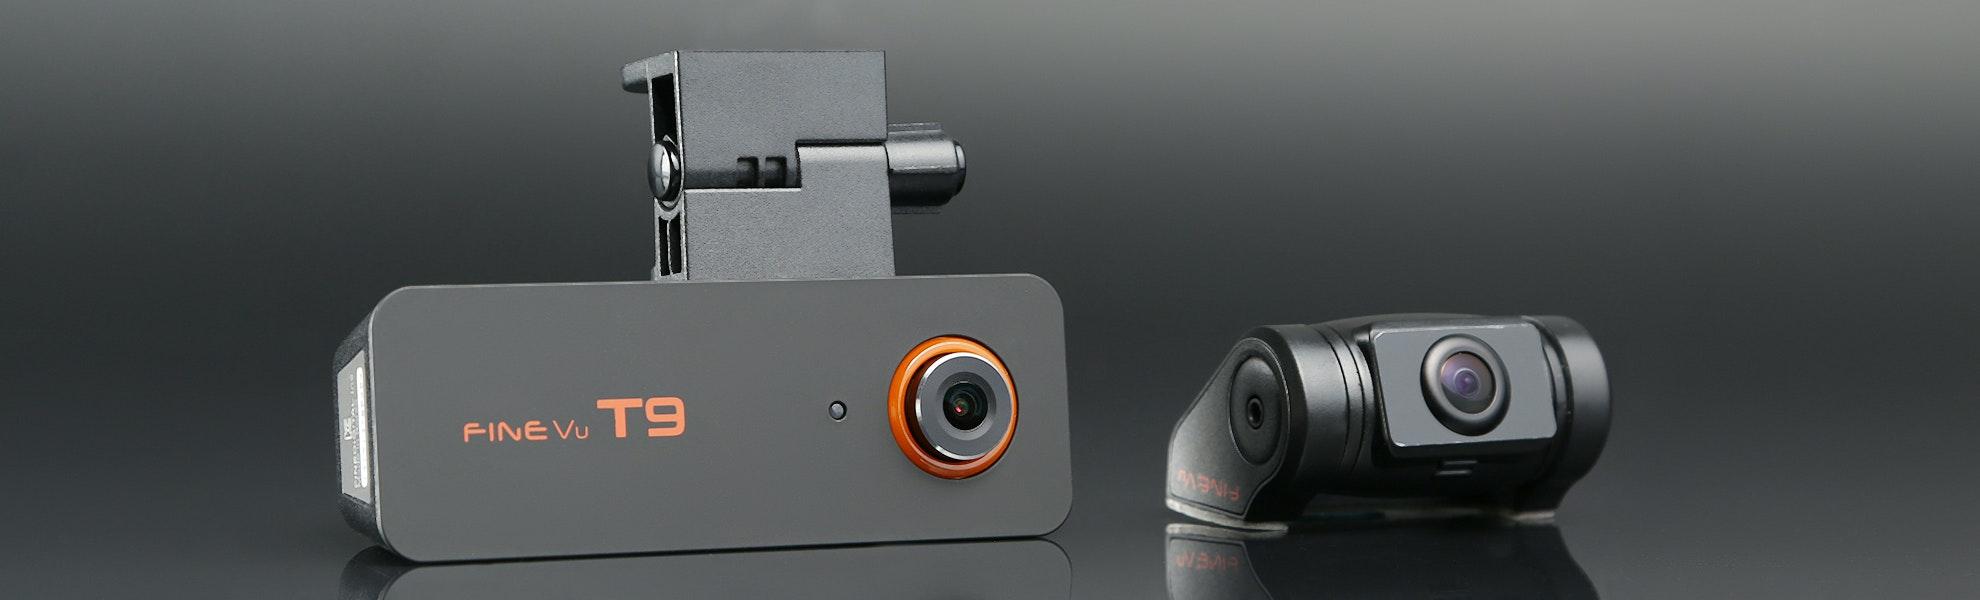 FineVu T9 Dual Channel Dash Camera